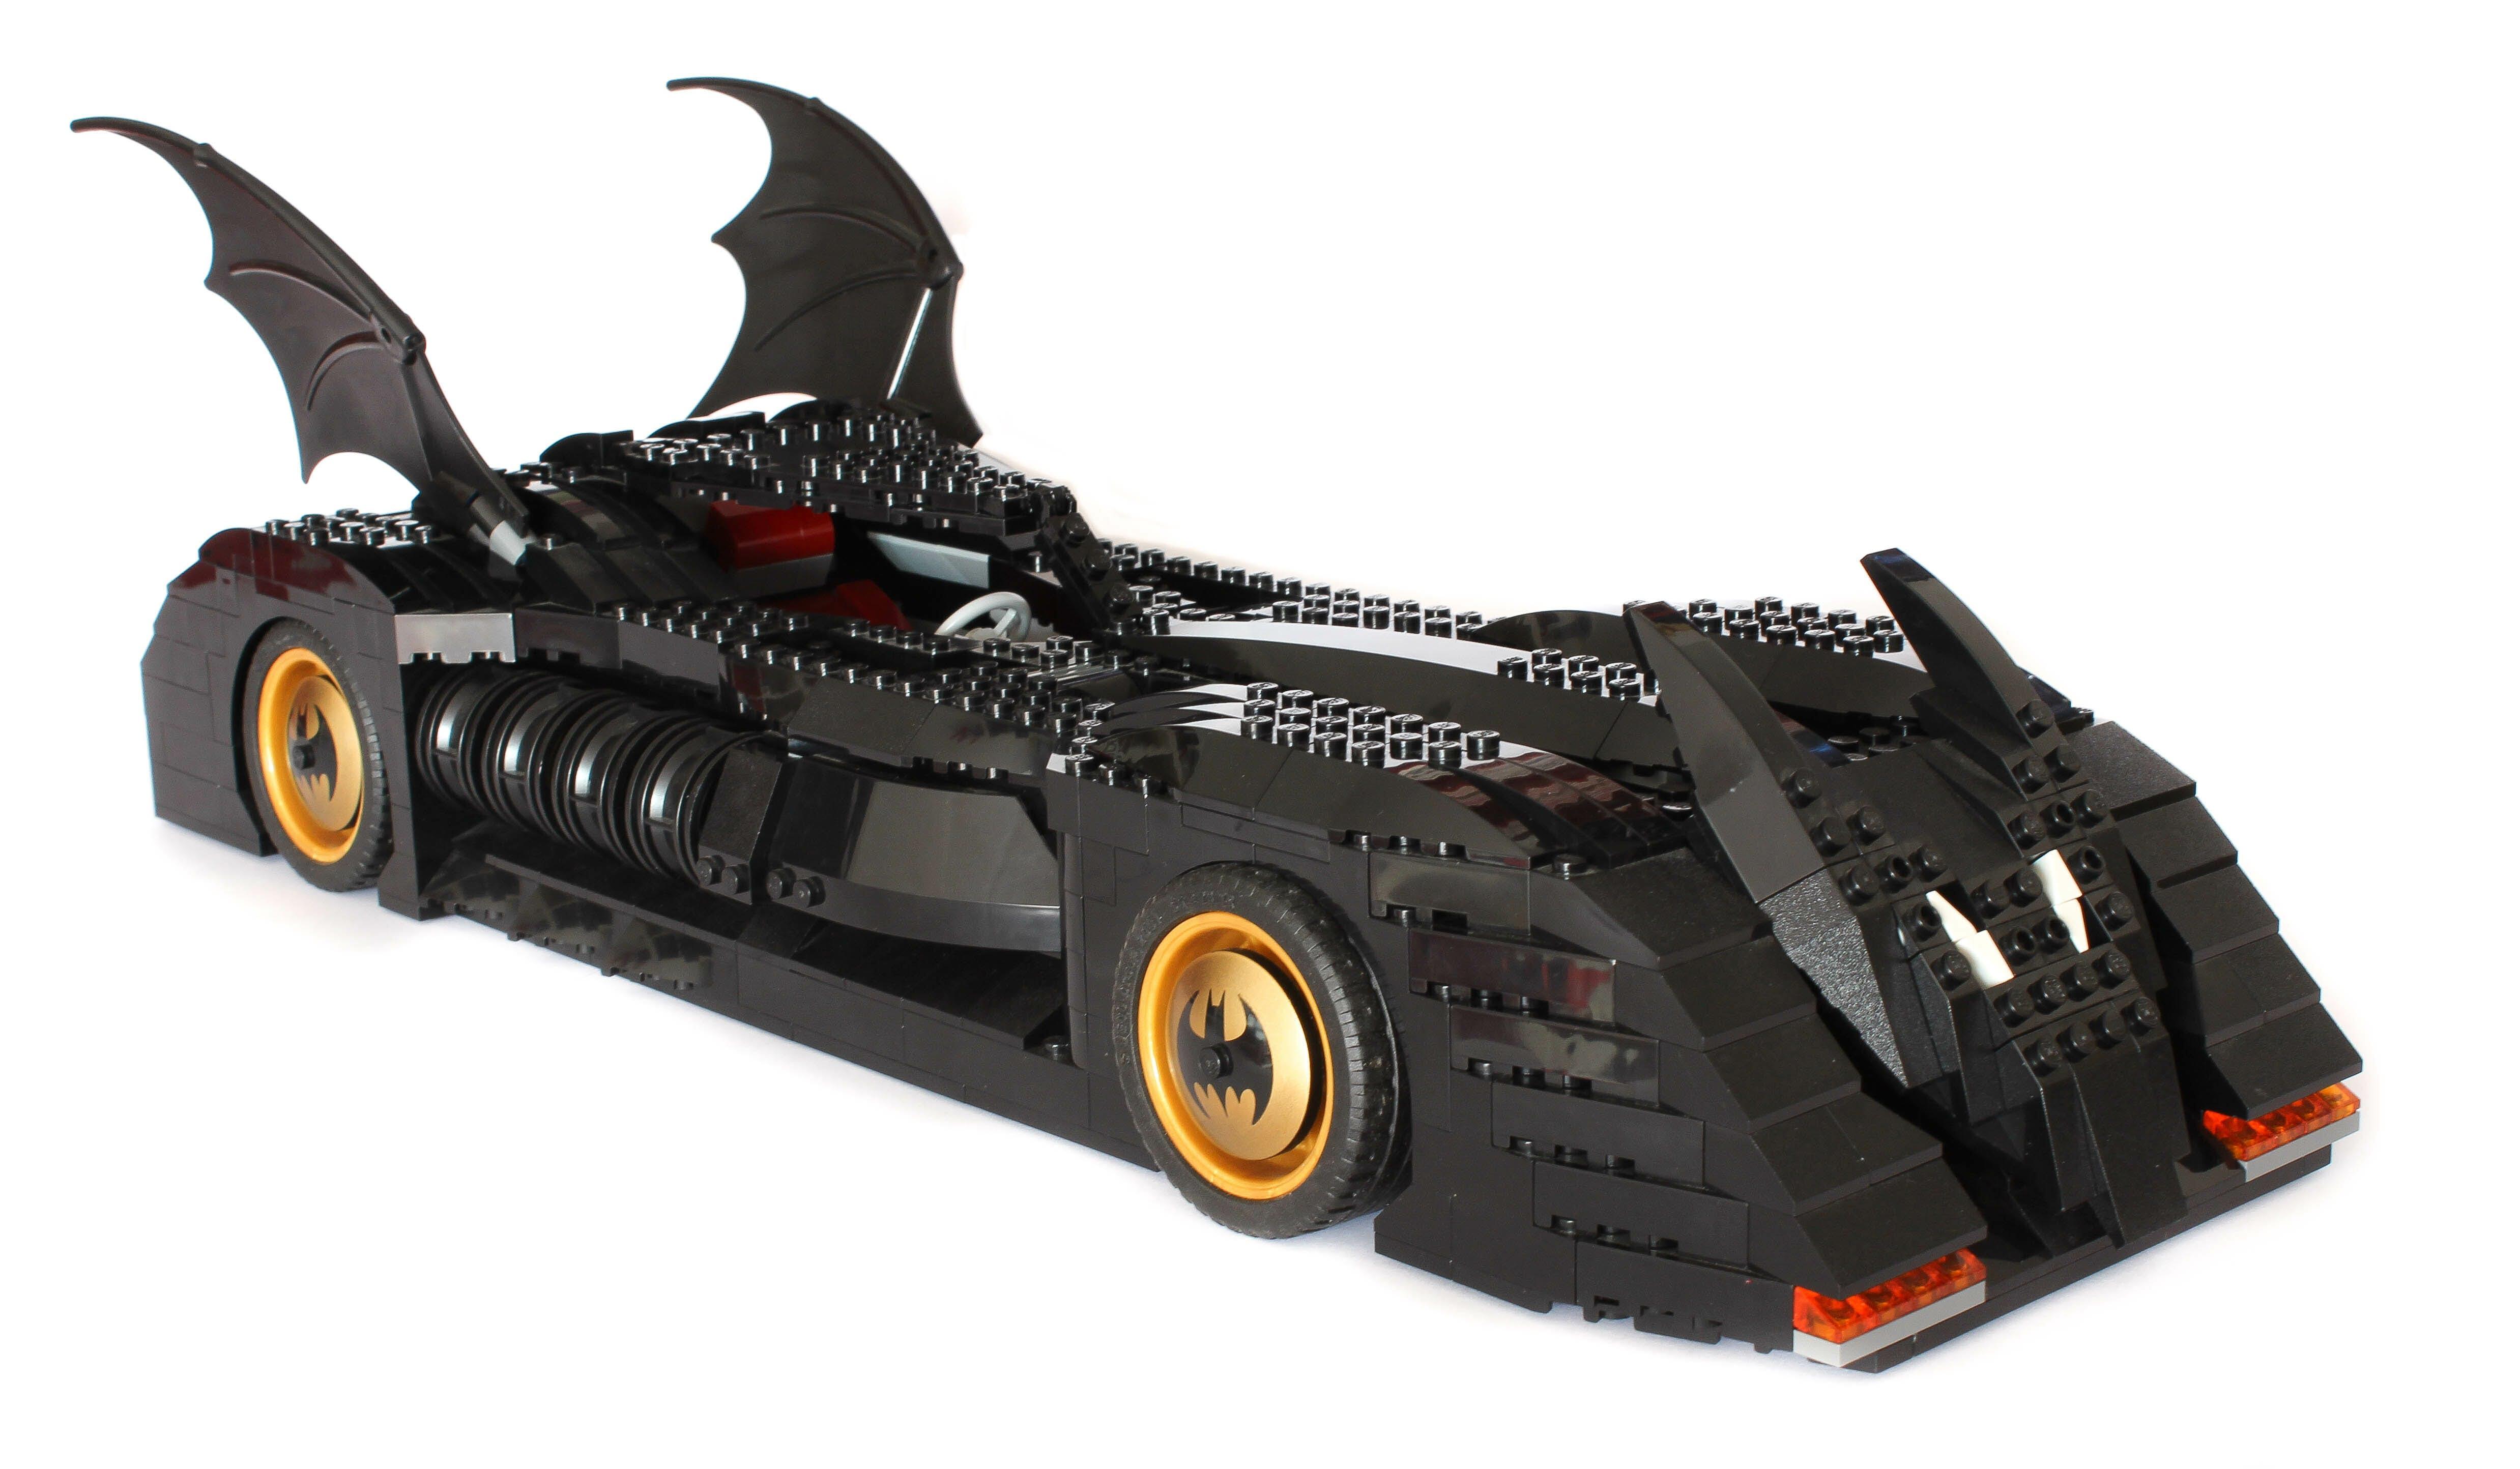 lego batman - Batmobile Ultimate Collector's Edition (2006)